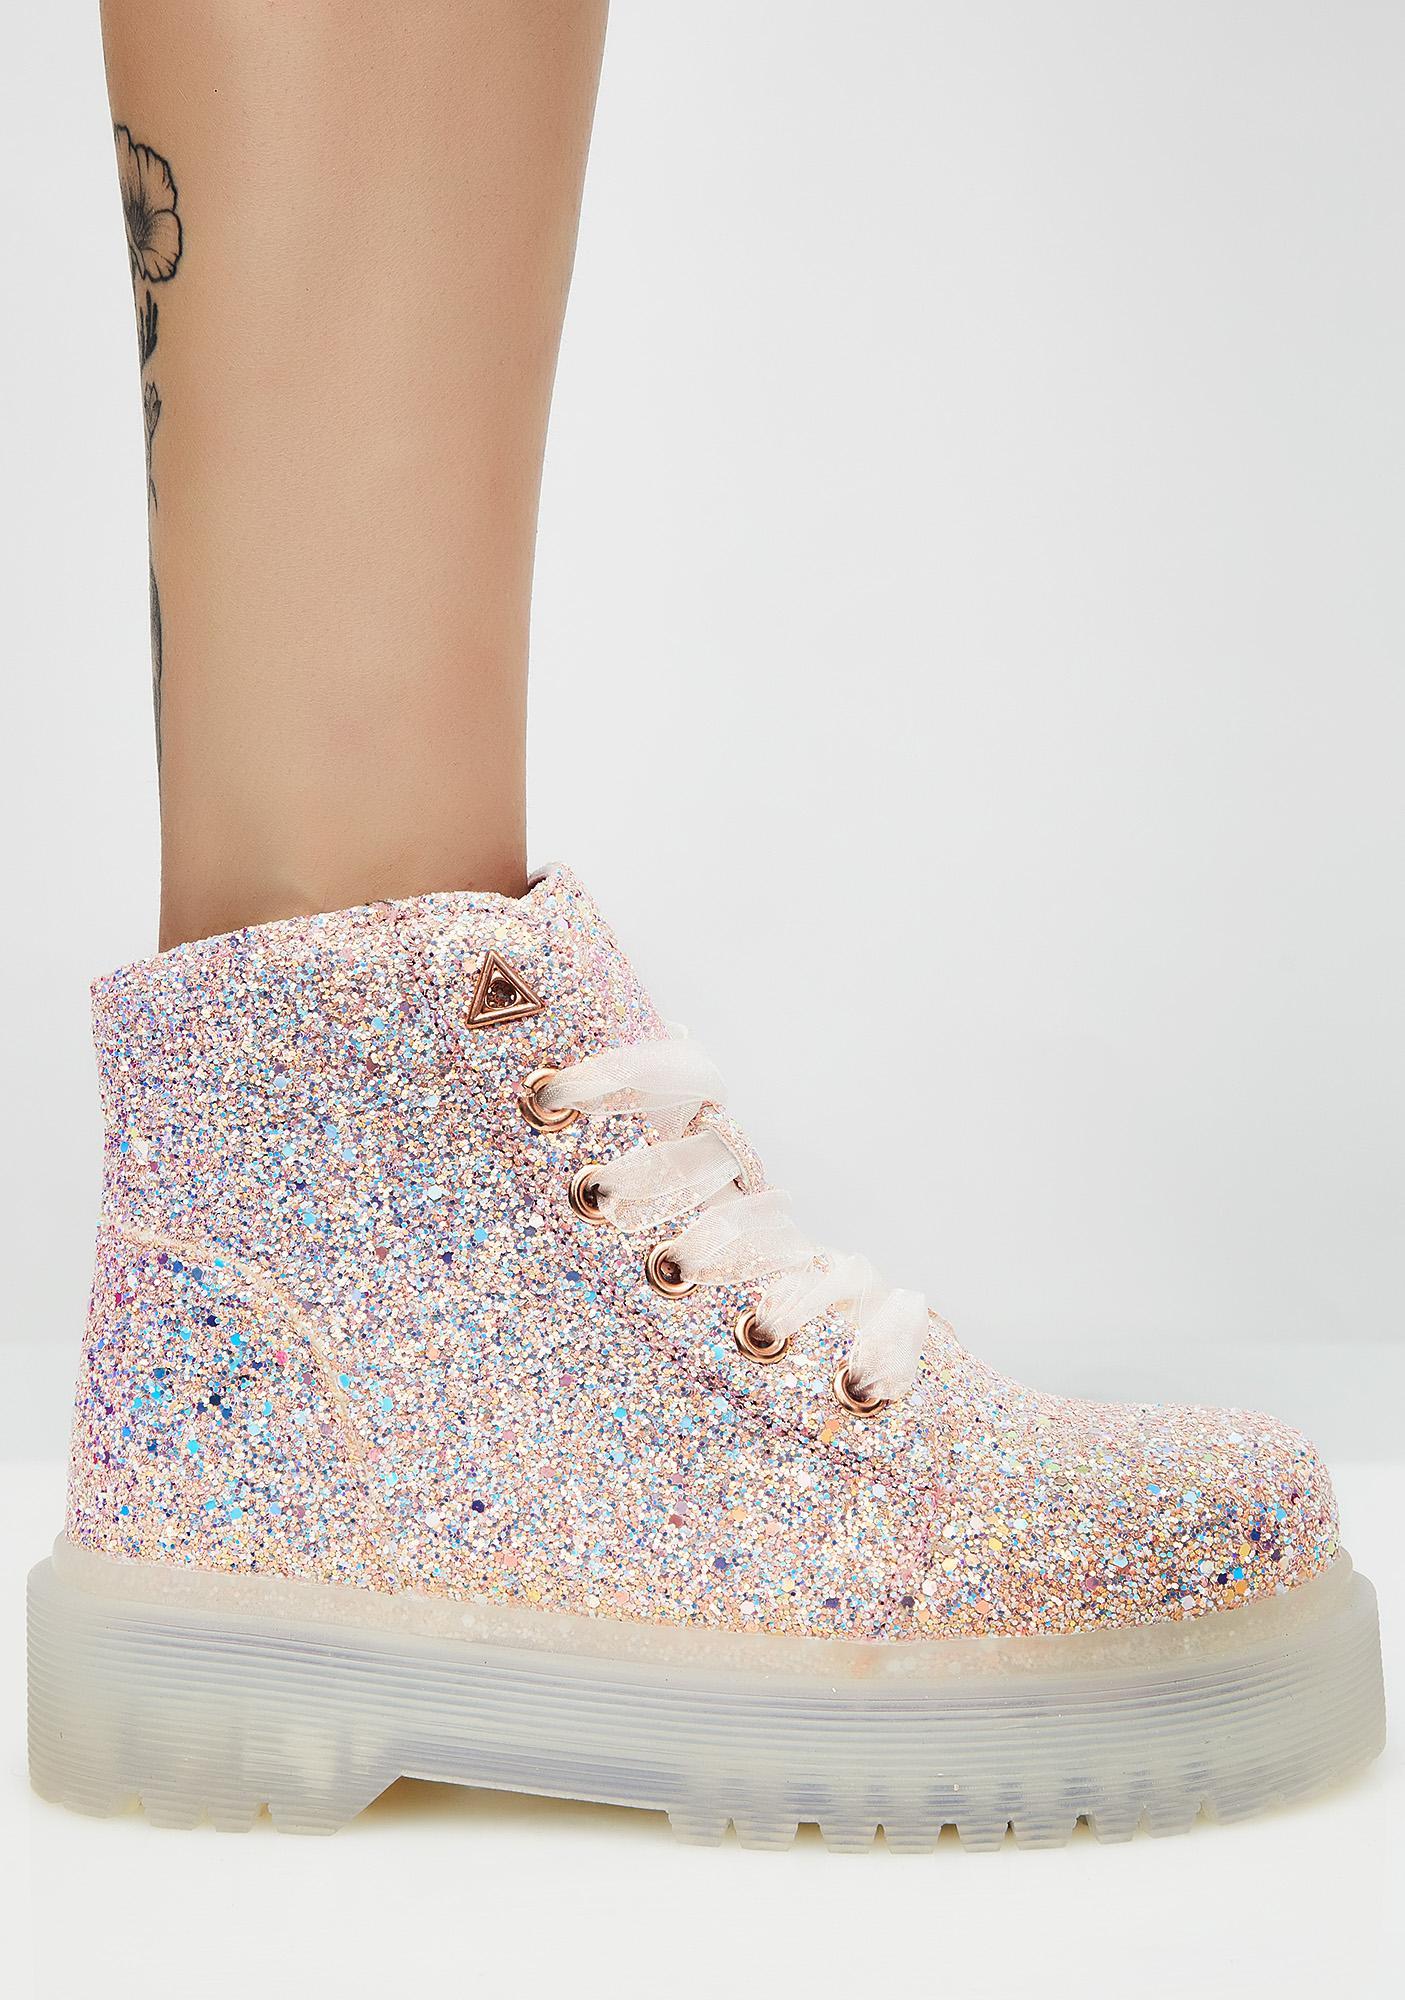 Y.R.U. Fairy Wand(erers) Slayr Boots